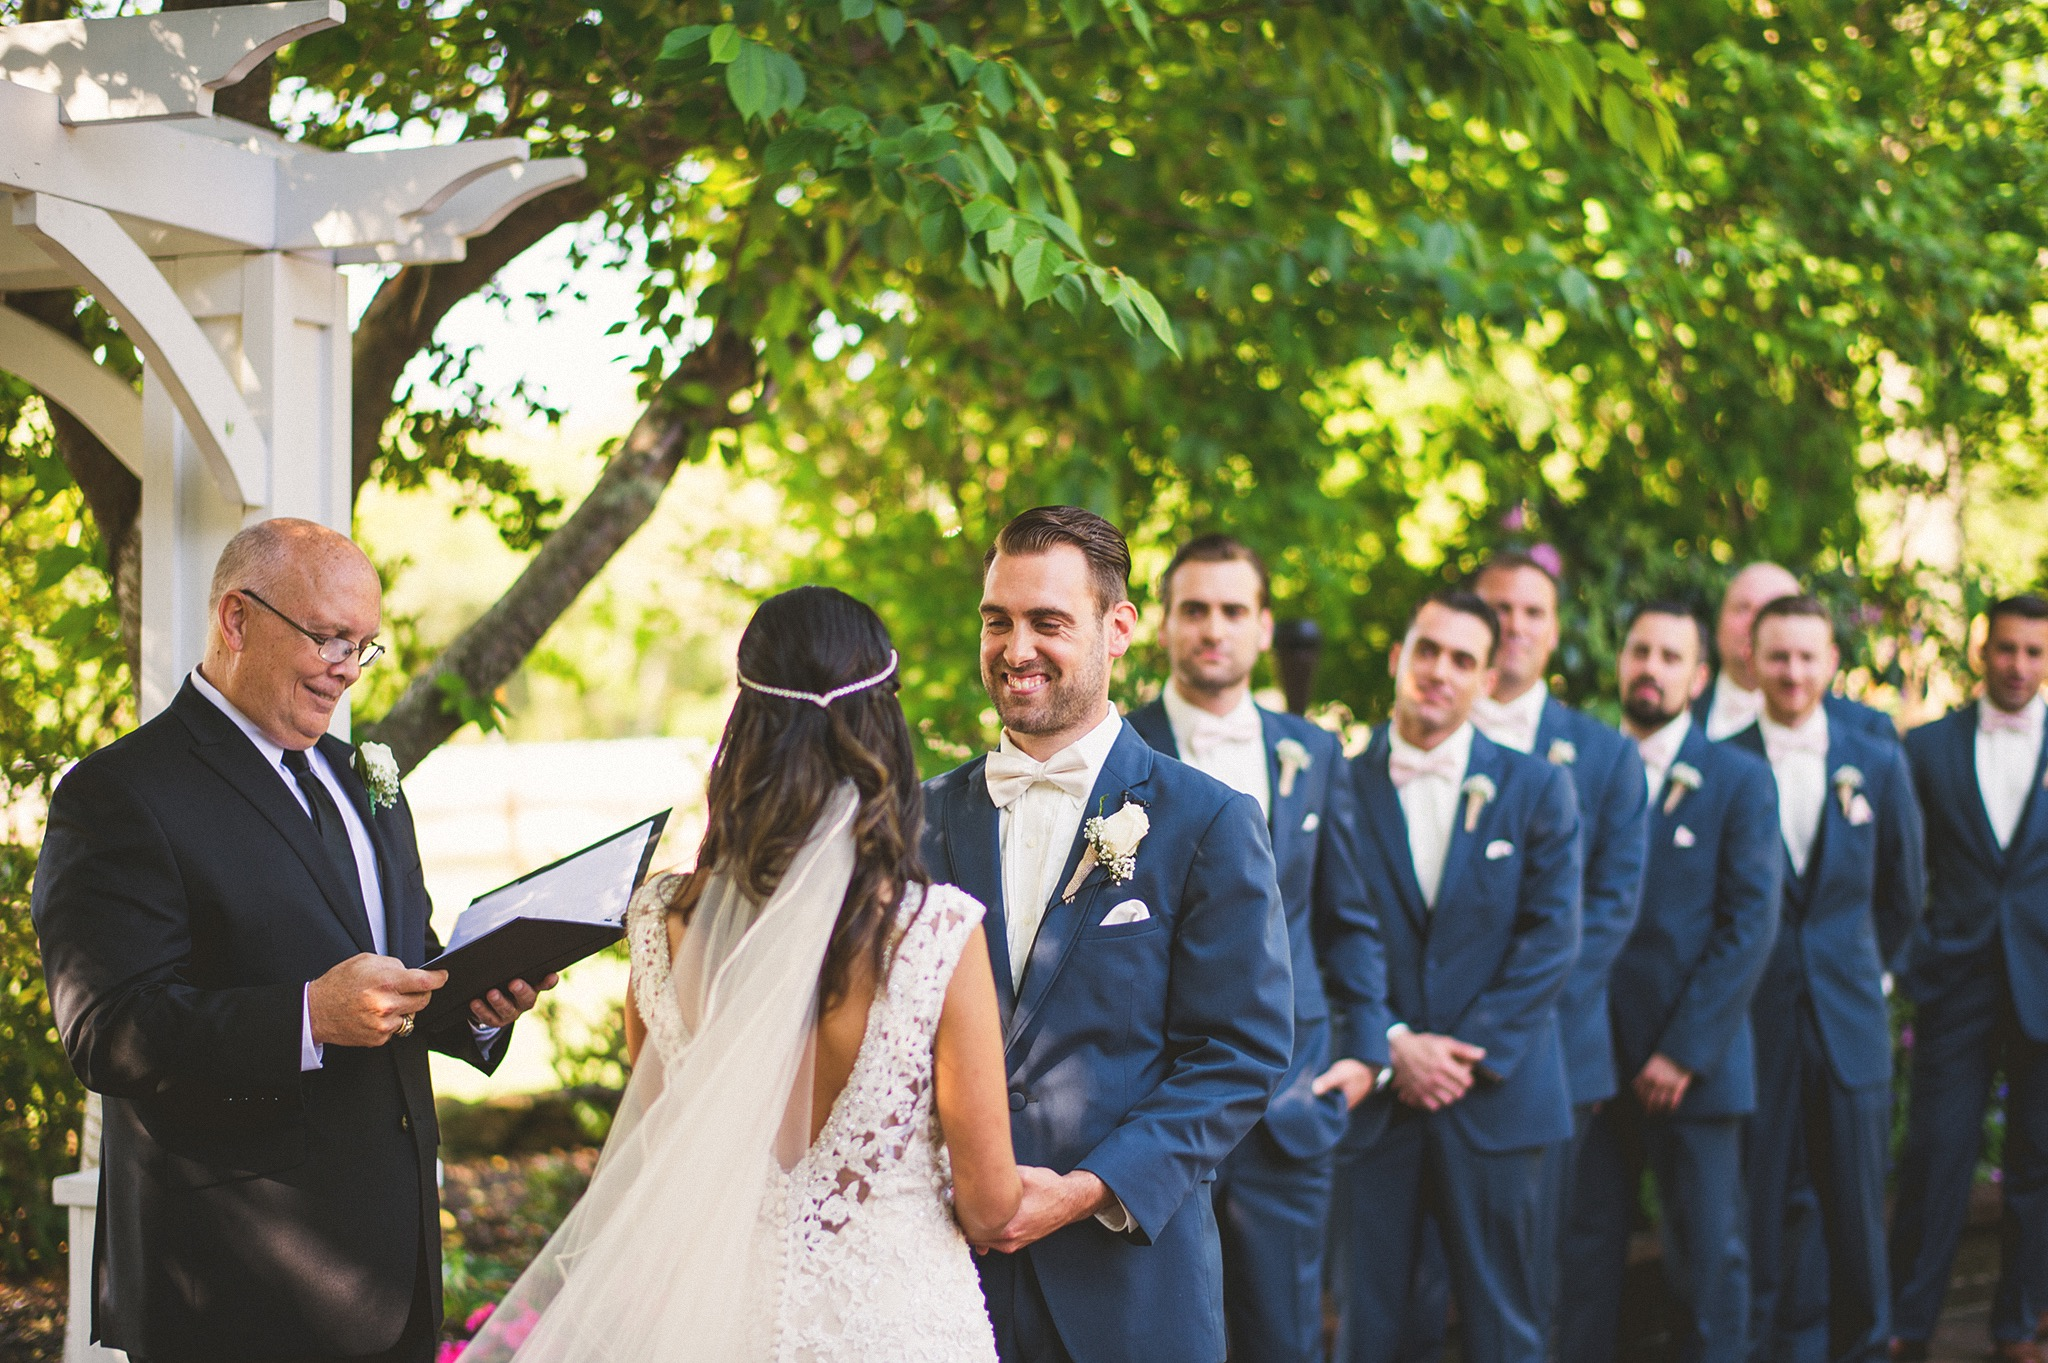 52-groom-reciting-vows.jpg